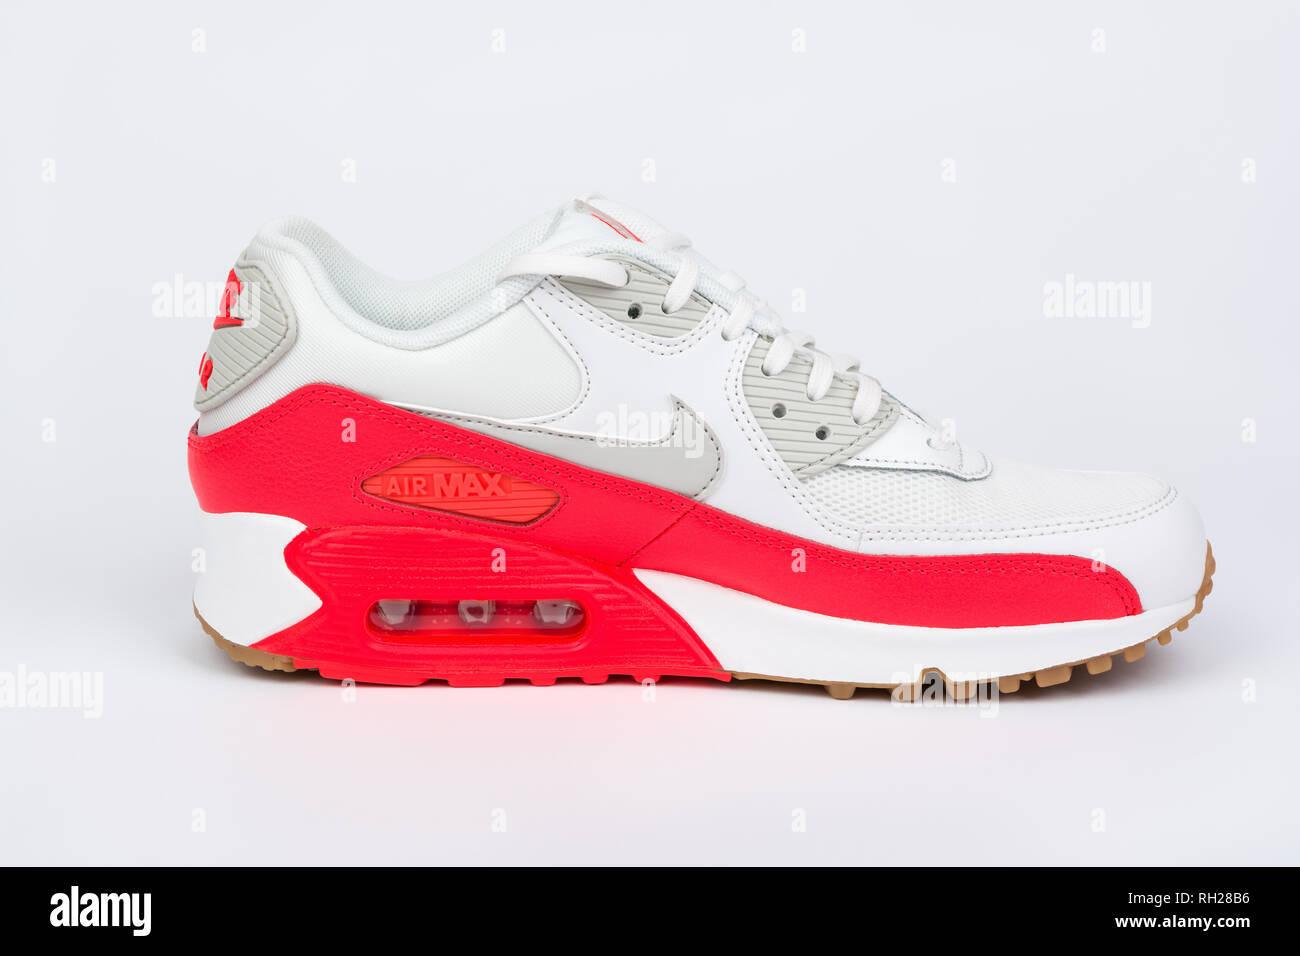 premium selection 5e760 f9ea9 BURGAS, BULGARIA - AUGUST 30, 2016  Nike Air MAX women s shoes - sneakers